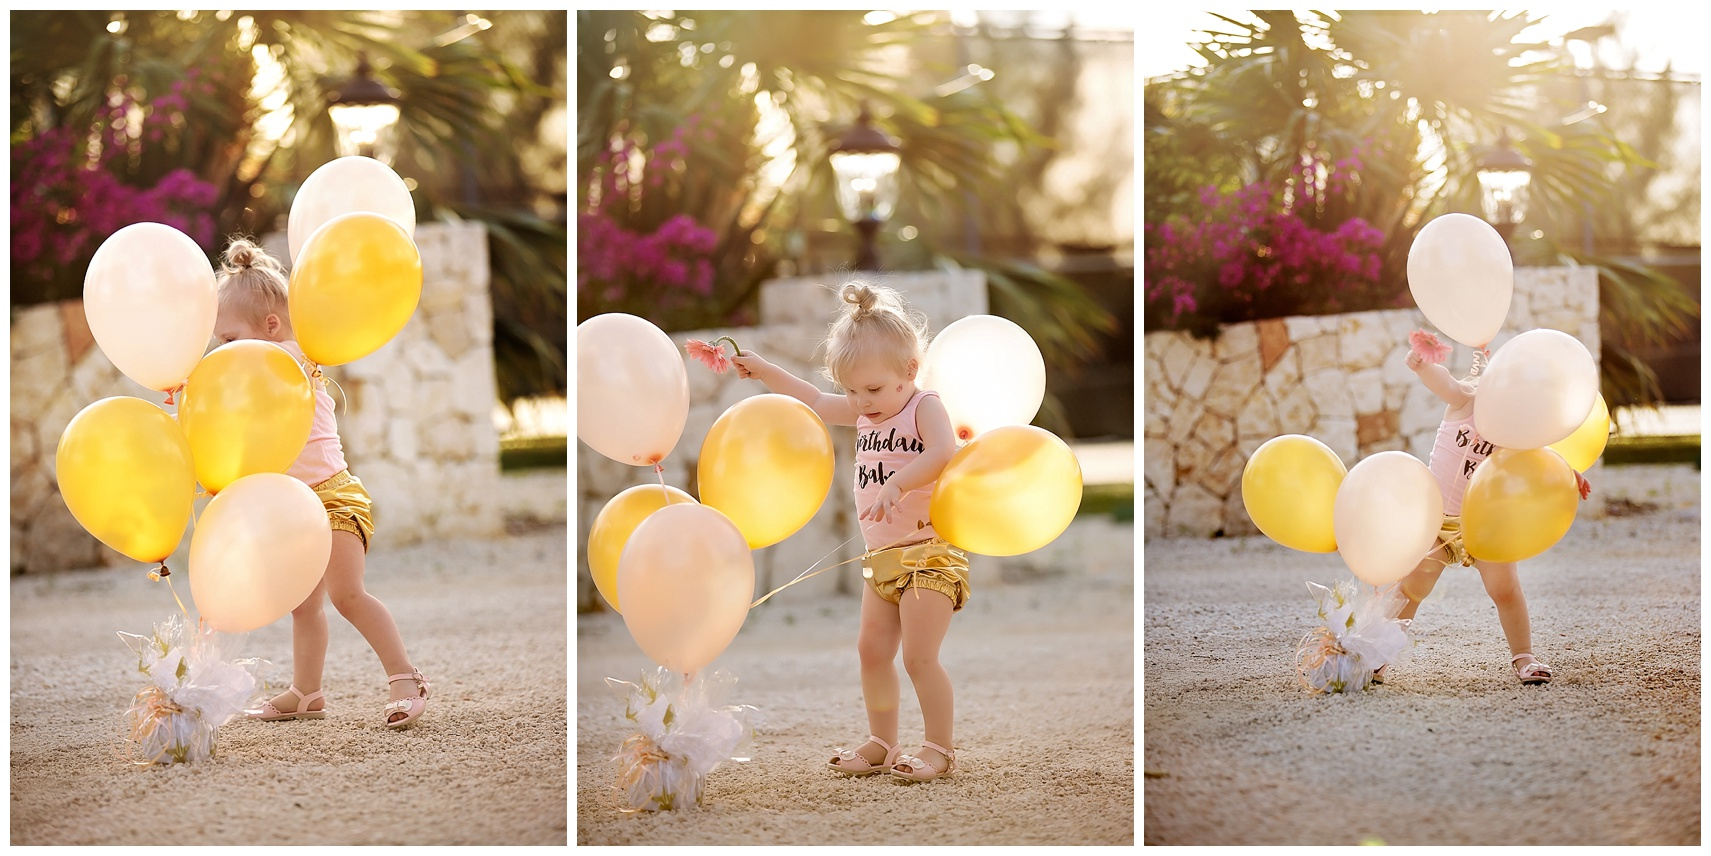 Cake Smash Photos   Cayman Islands Photographers   Happy Birthday Ellerie!